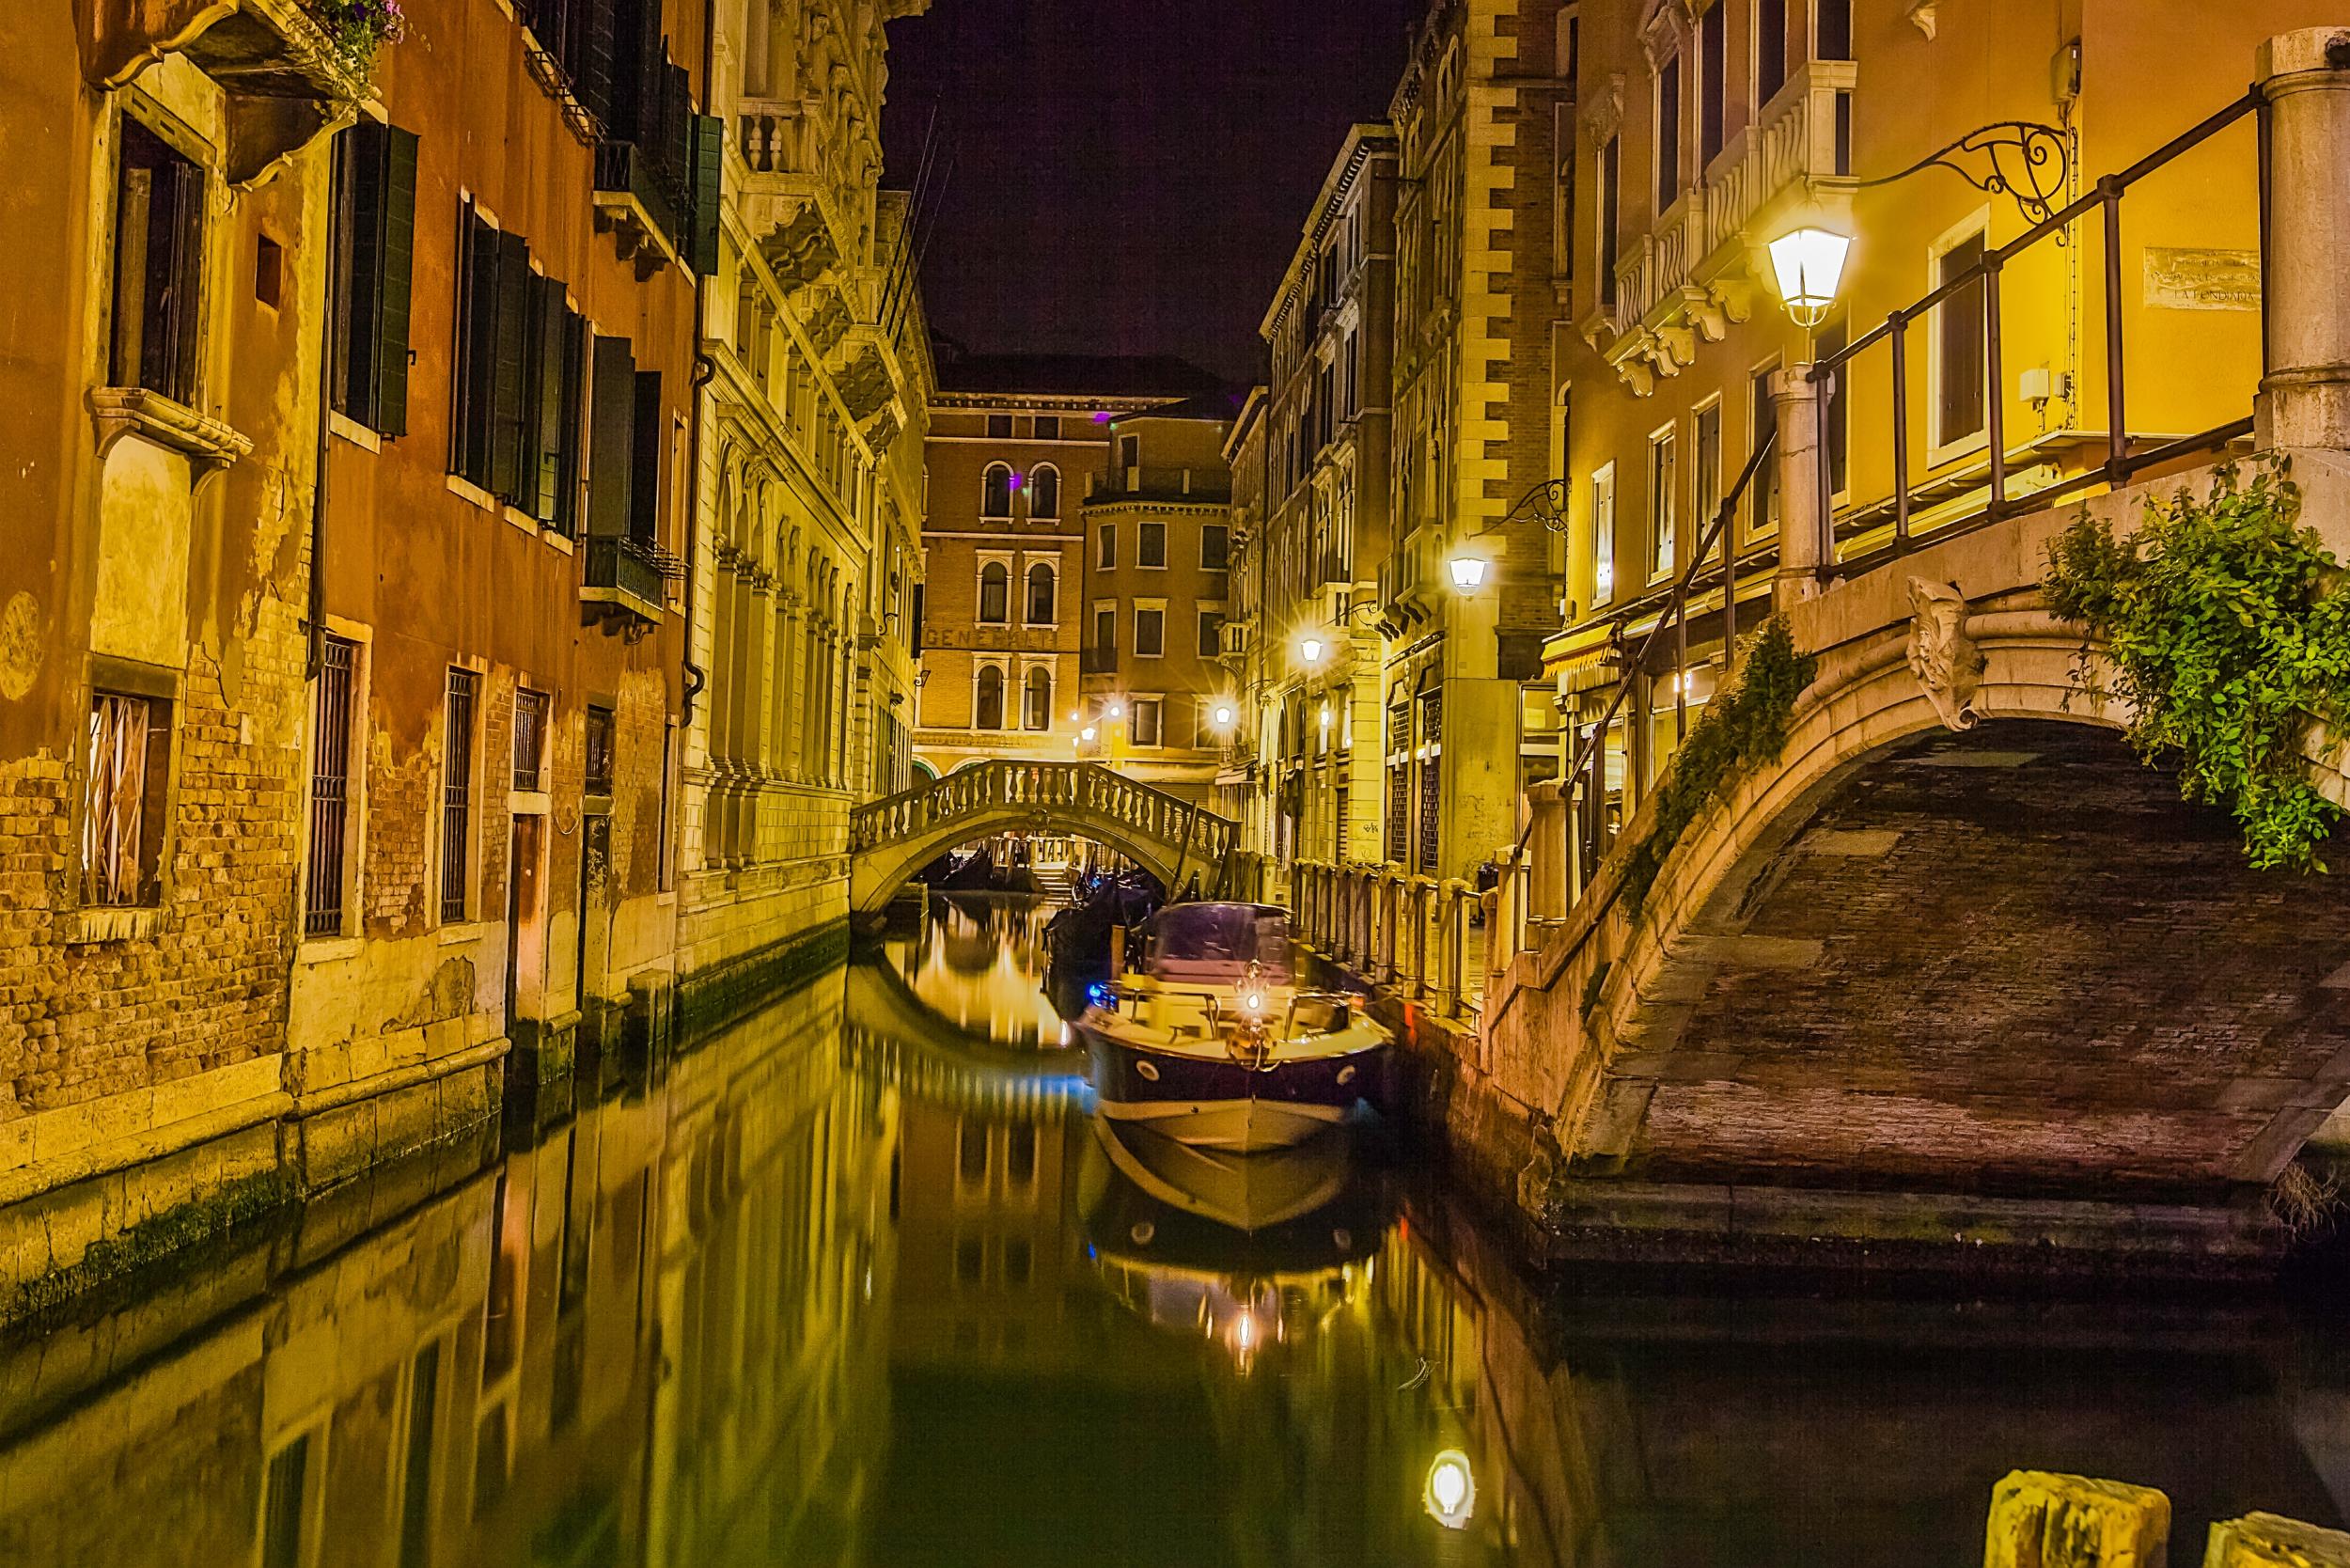 Night light wikipedia - File City Landscape Venice At Night Light 8174786148 Jpg